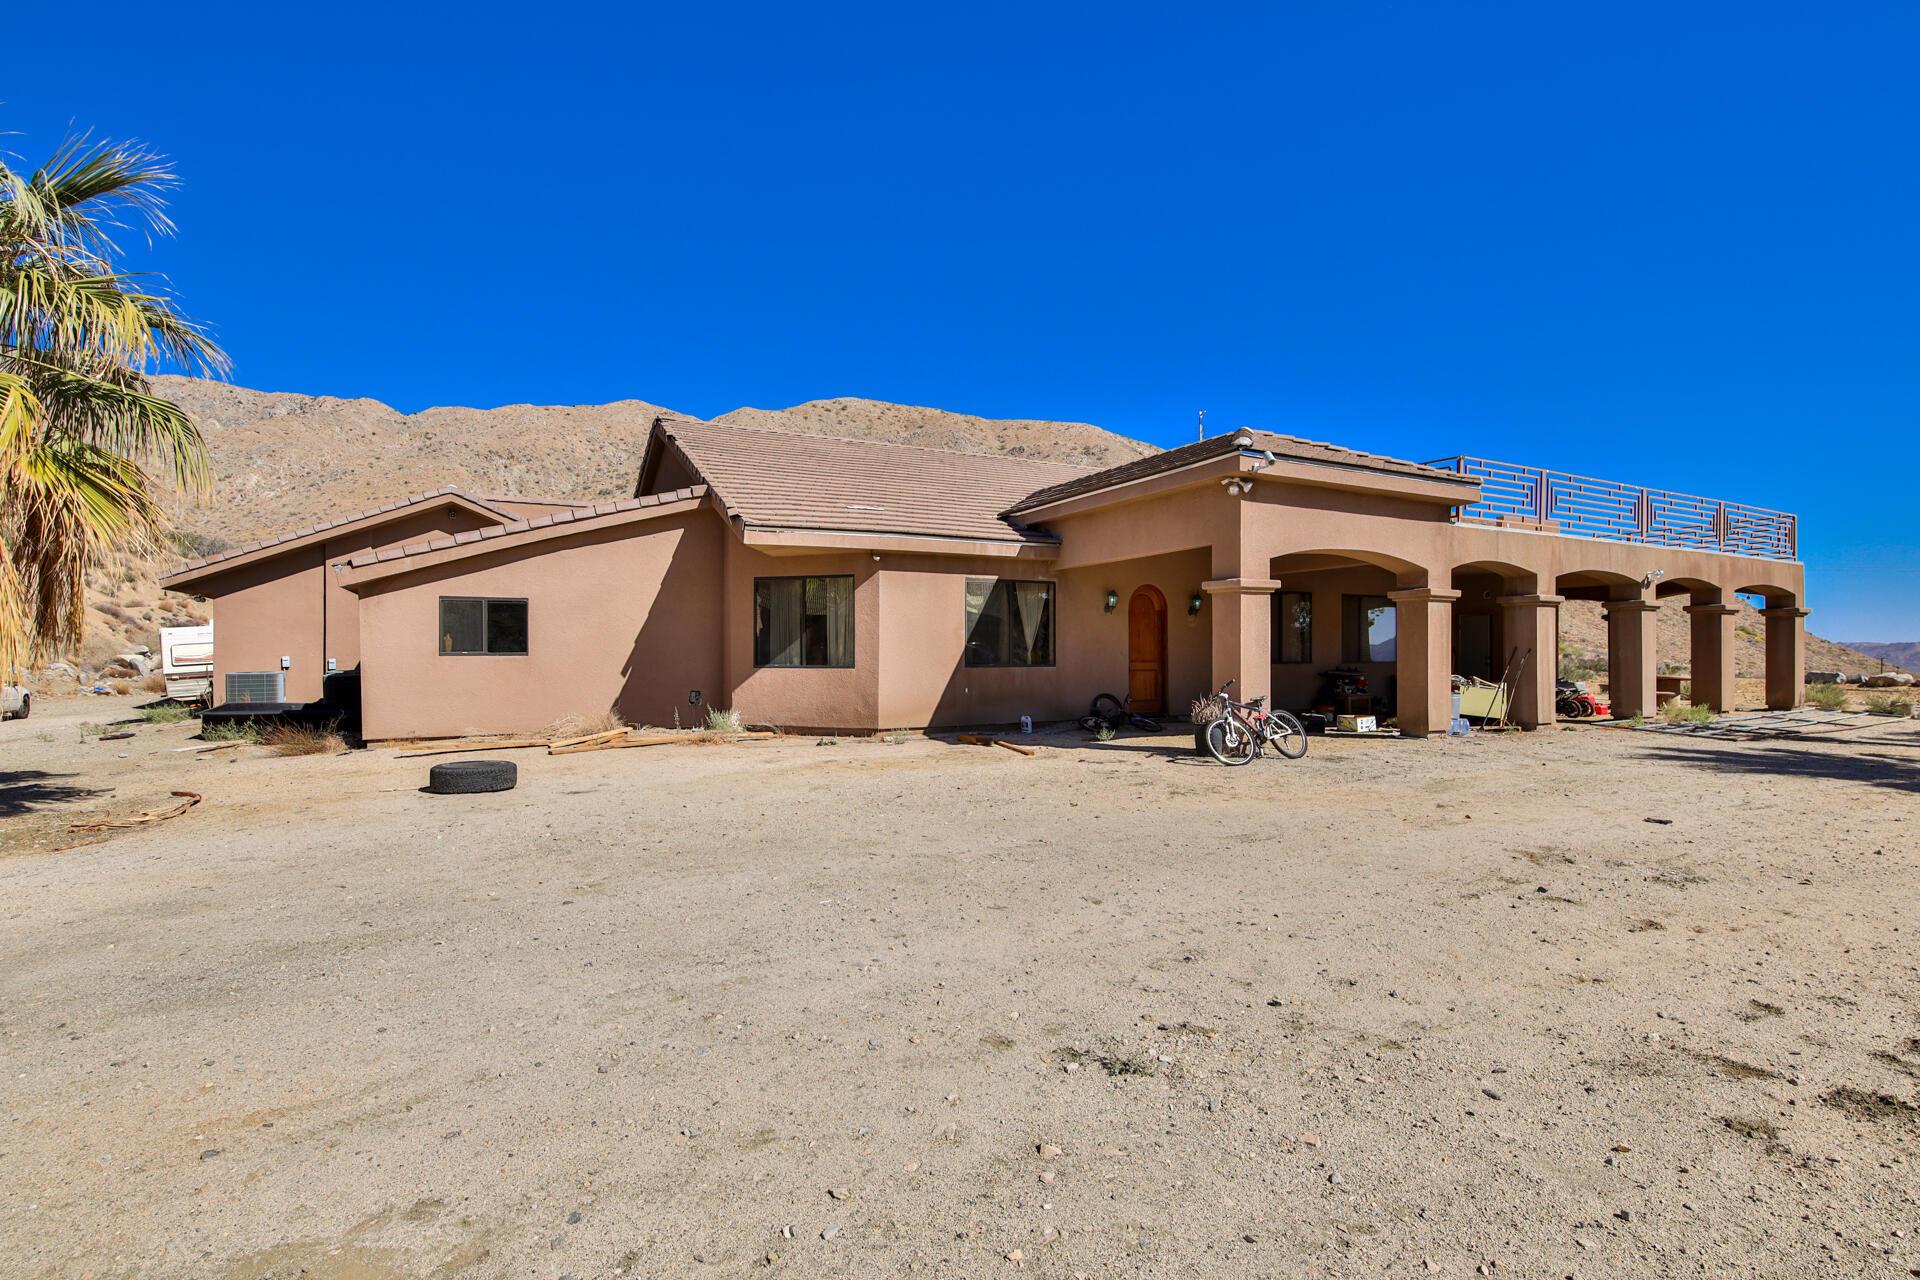 49730 Big Morongo Road, Morongo Valley, CA 92256